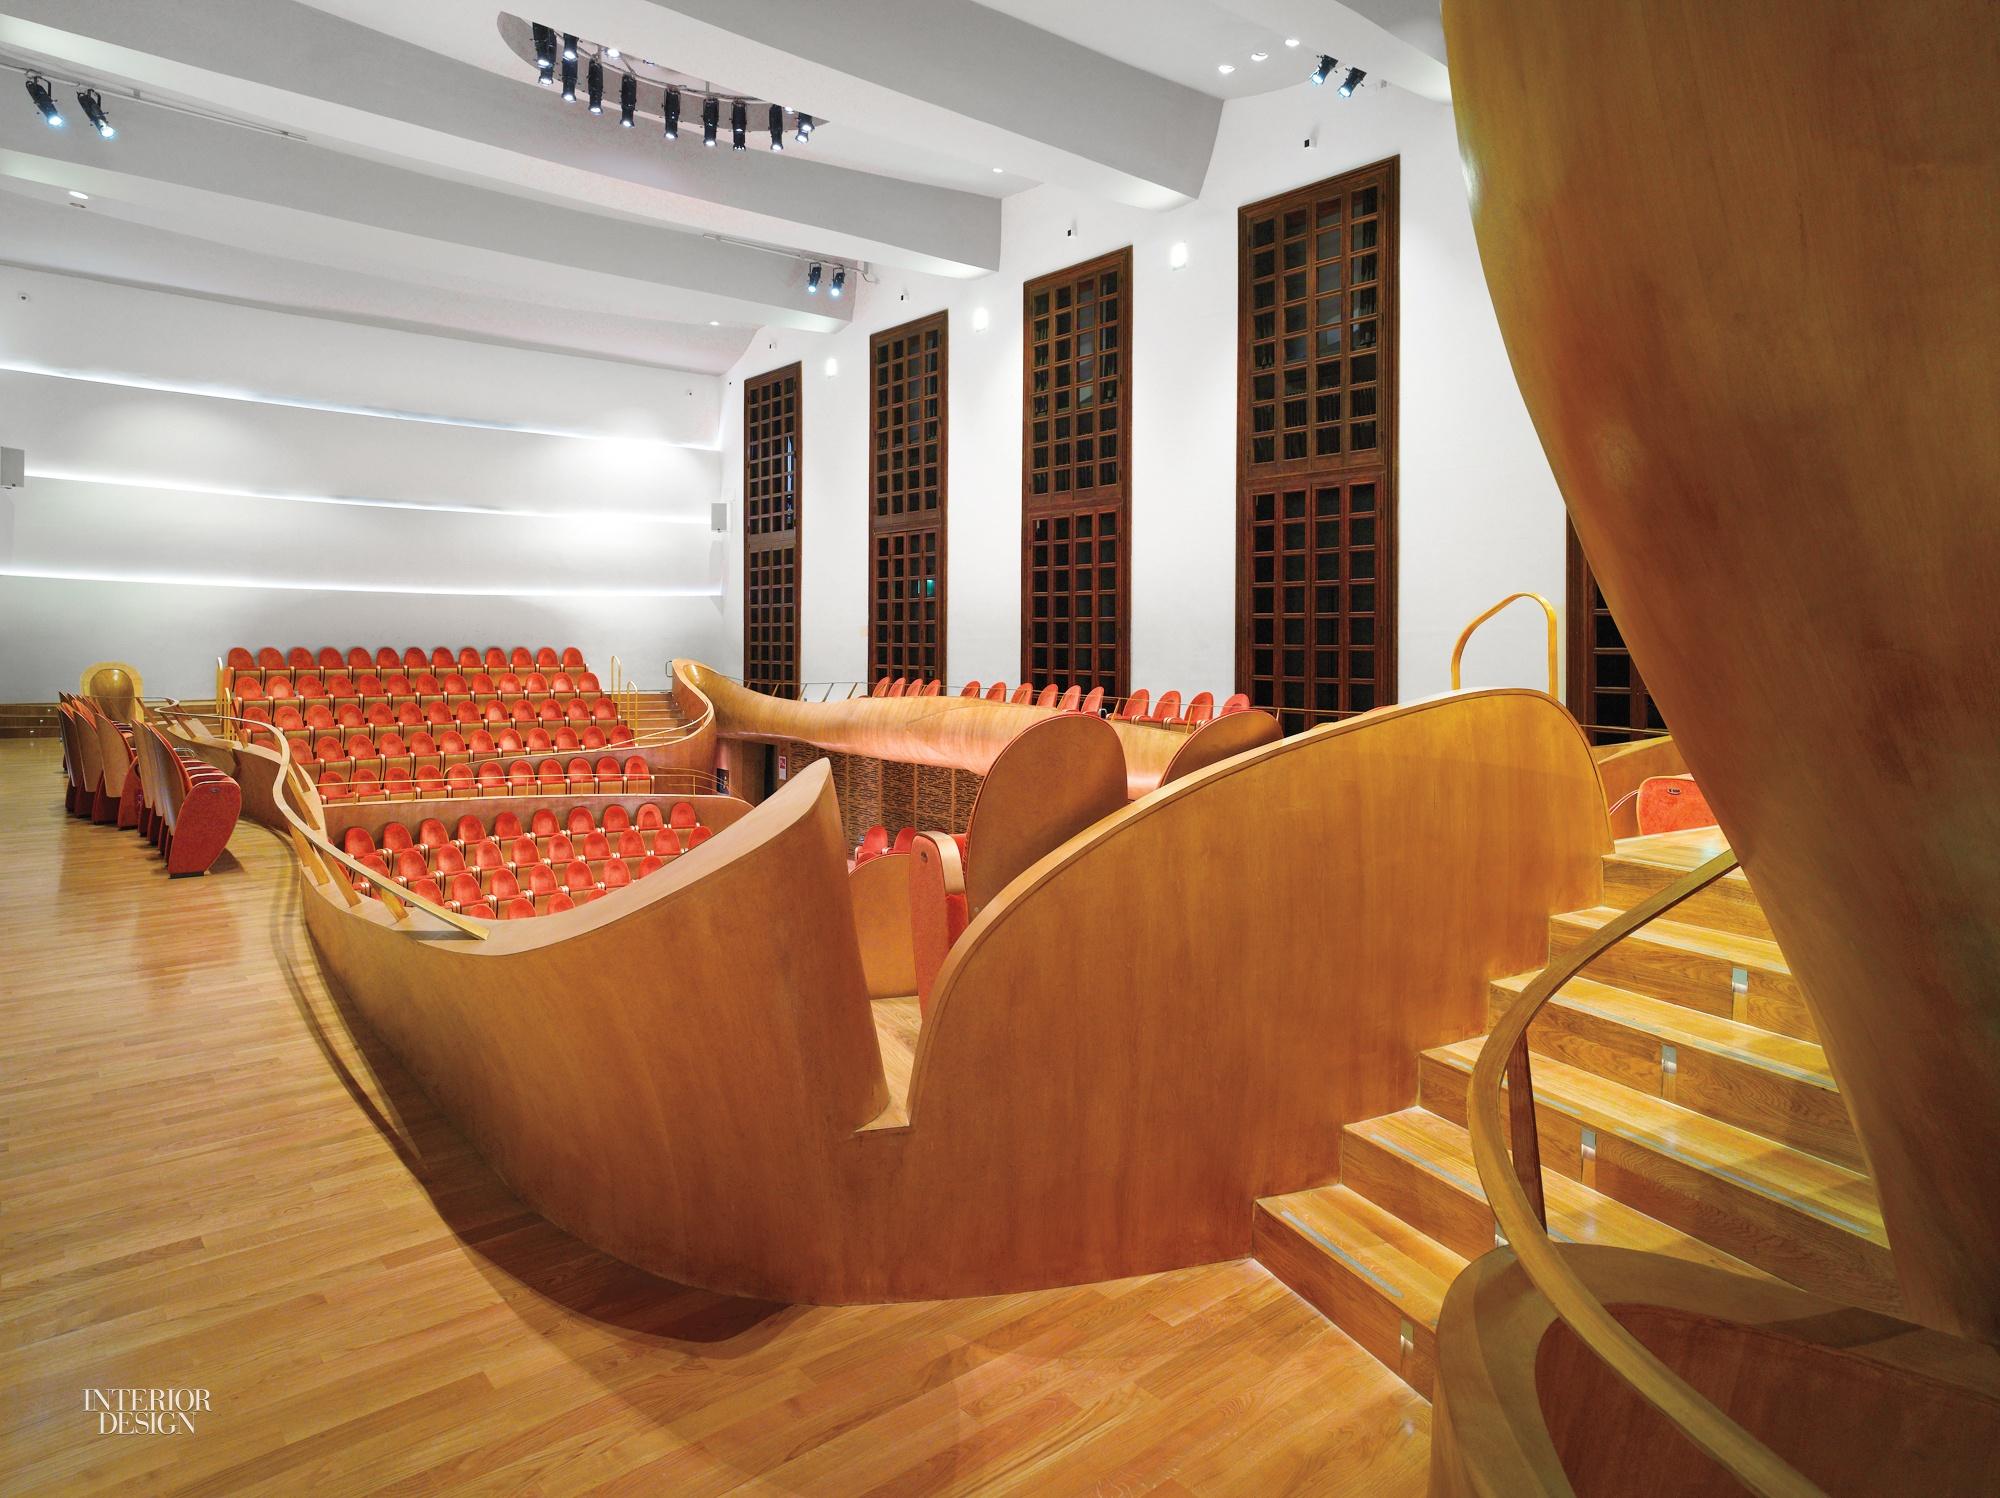 Museo Del Violino.Arkpabi Completes Stunning Renovation Of The Museo Del Violino In